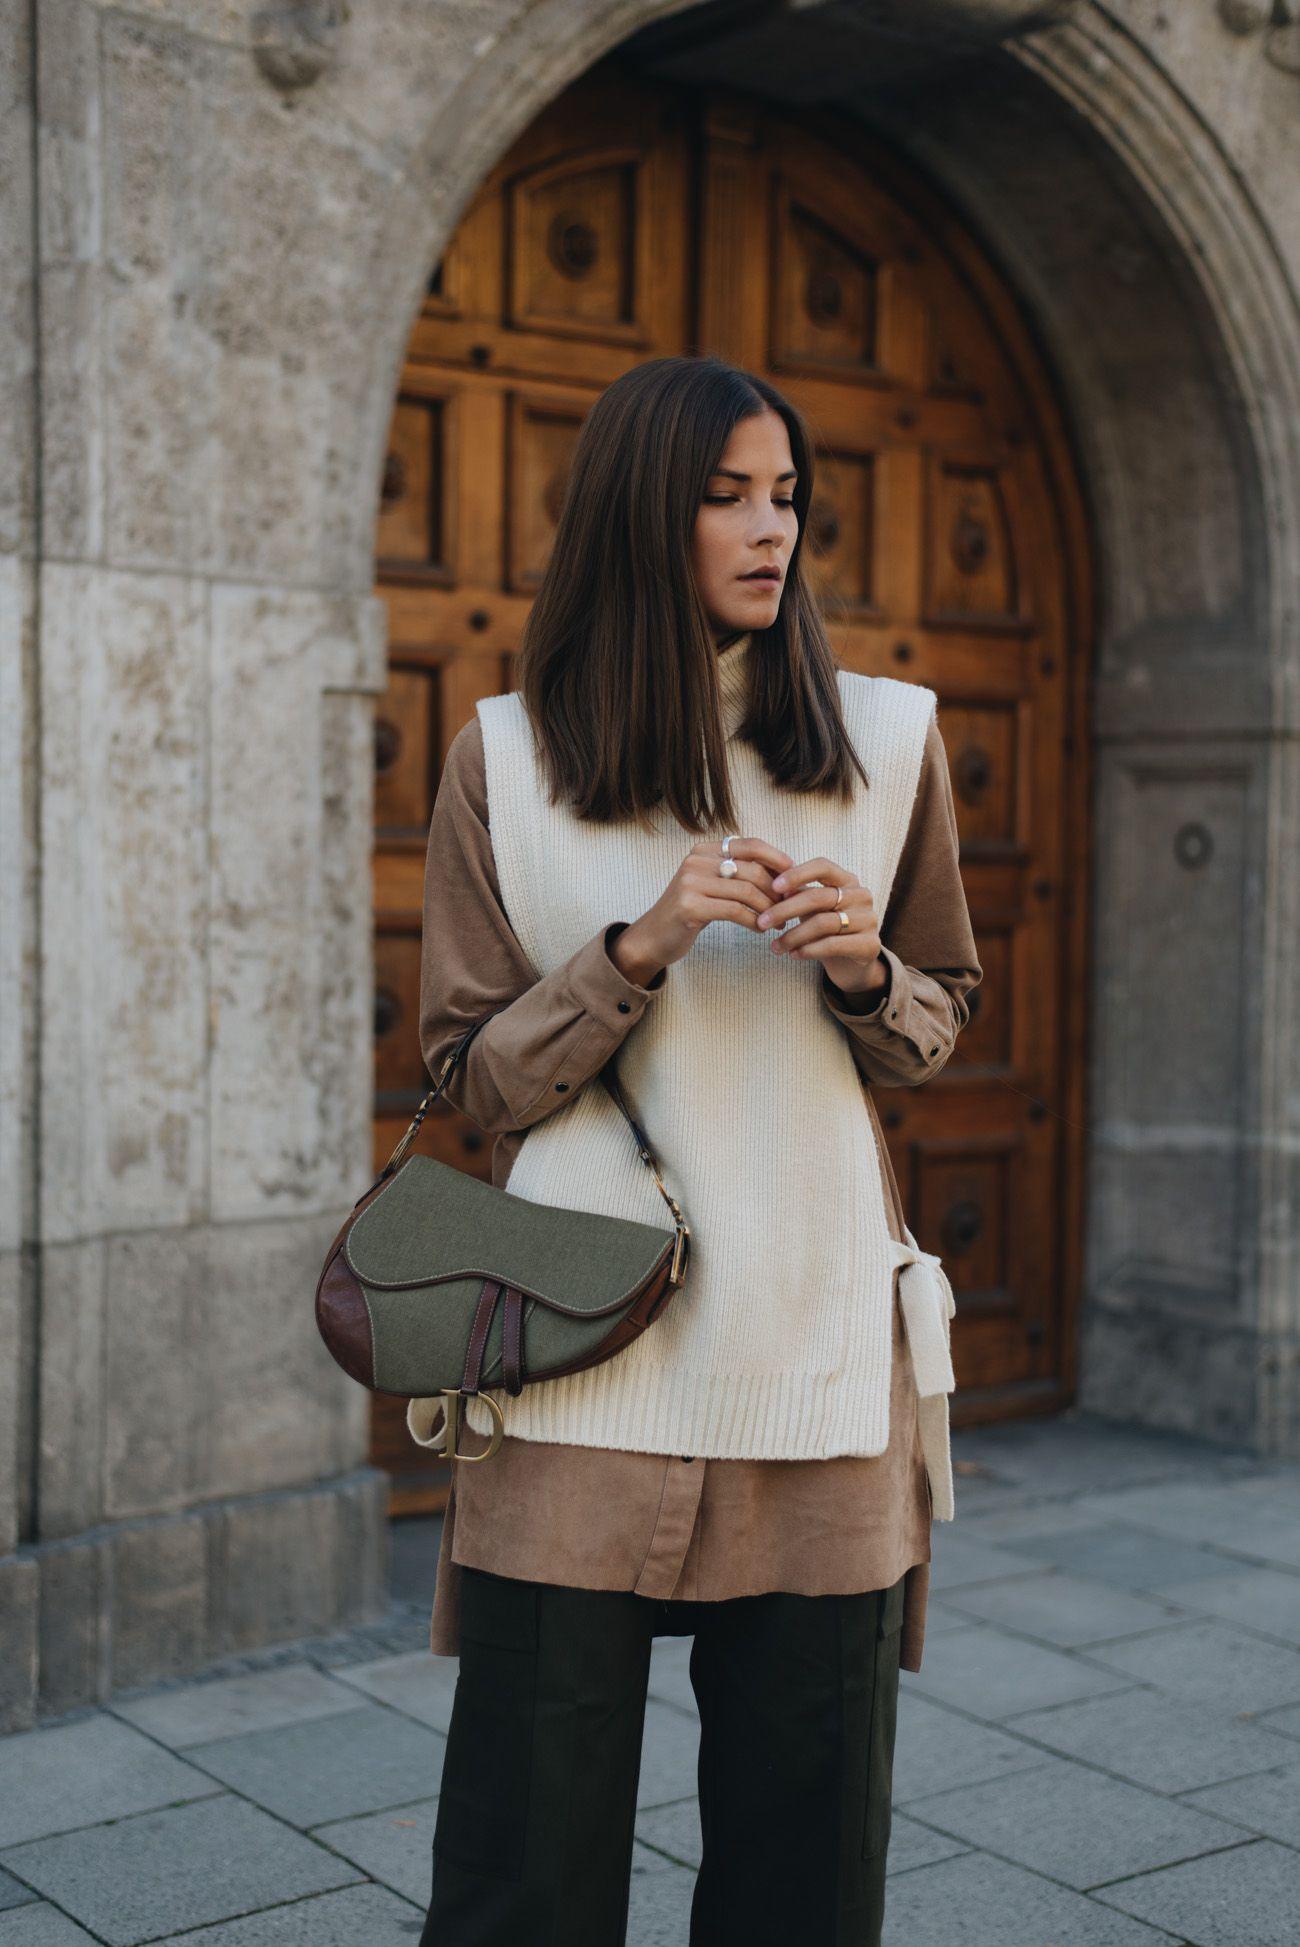 d2f6c5e591 german-fashion-and-lifestyle-blogger-influencer-nina-schwichtenberg-fashiioncarpet